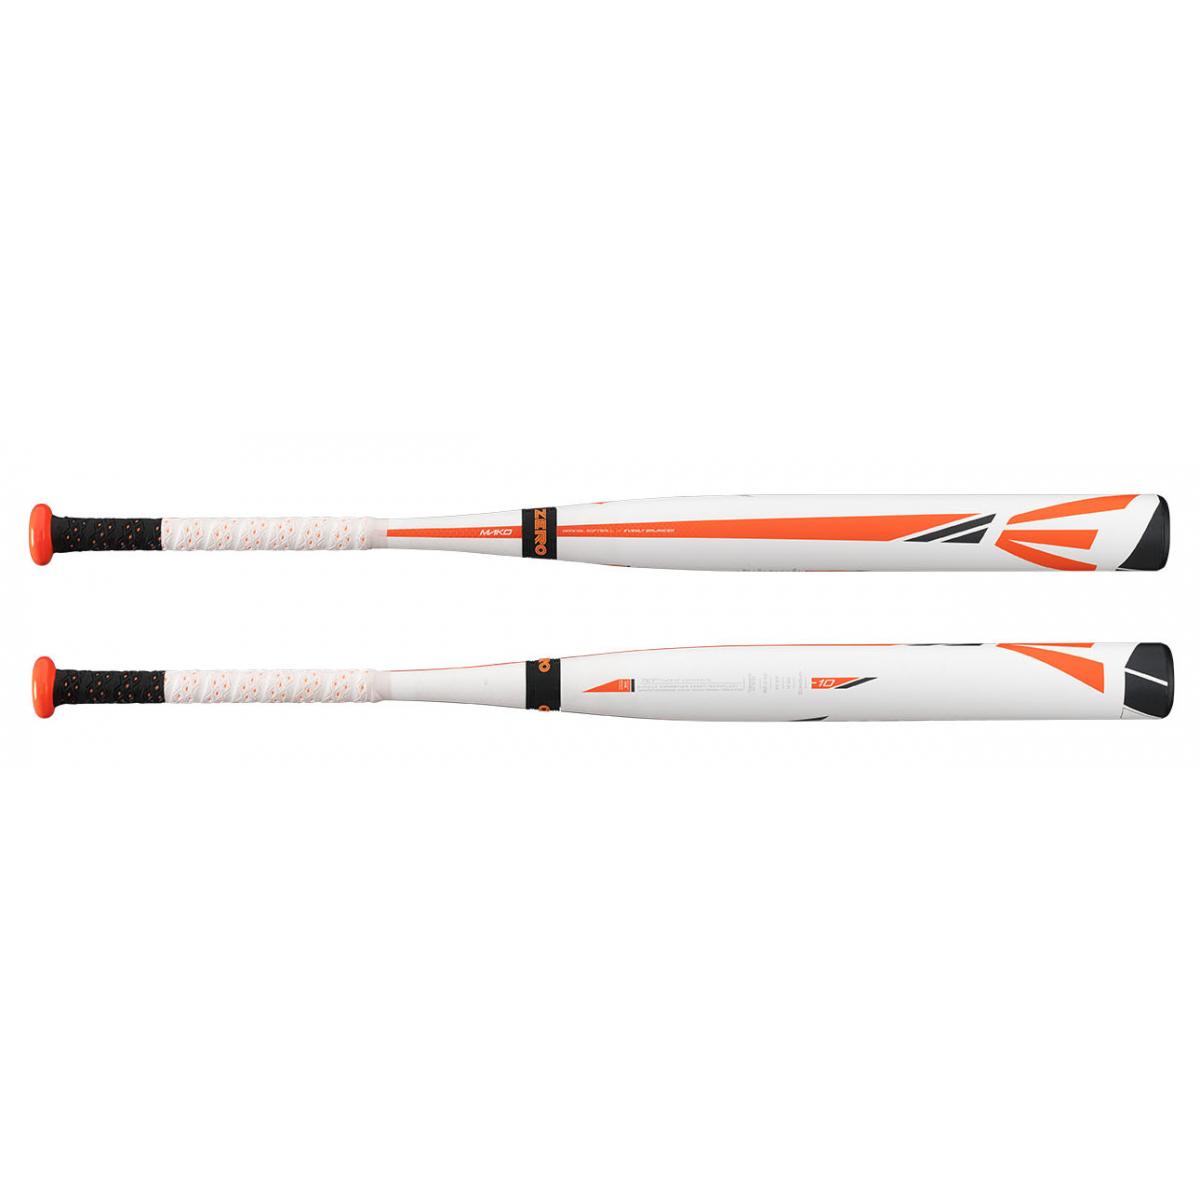 easton-2015-fp15mk10-mako-cxn-zero-10-fastpitch-softball-bat-33-inch-23-ounce FP15MK10-33-inch-23-oz Easton  Easton Mako Fast Pitch Softball Bat. CXN zero 2-piece composite speed